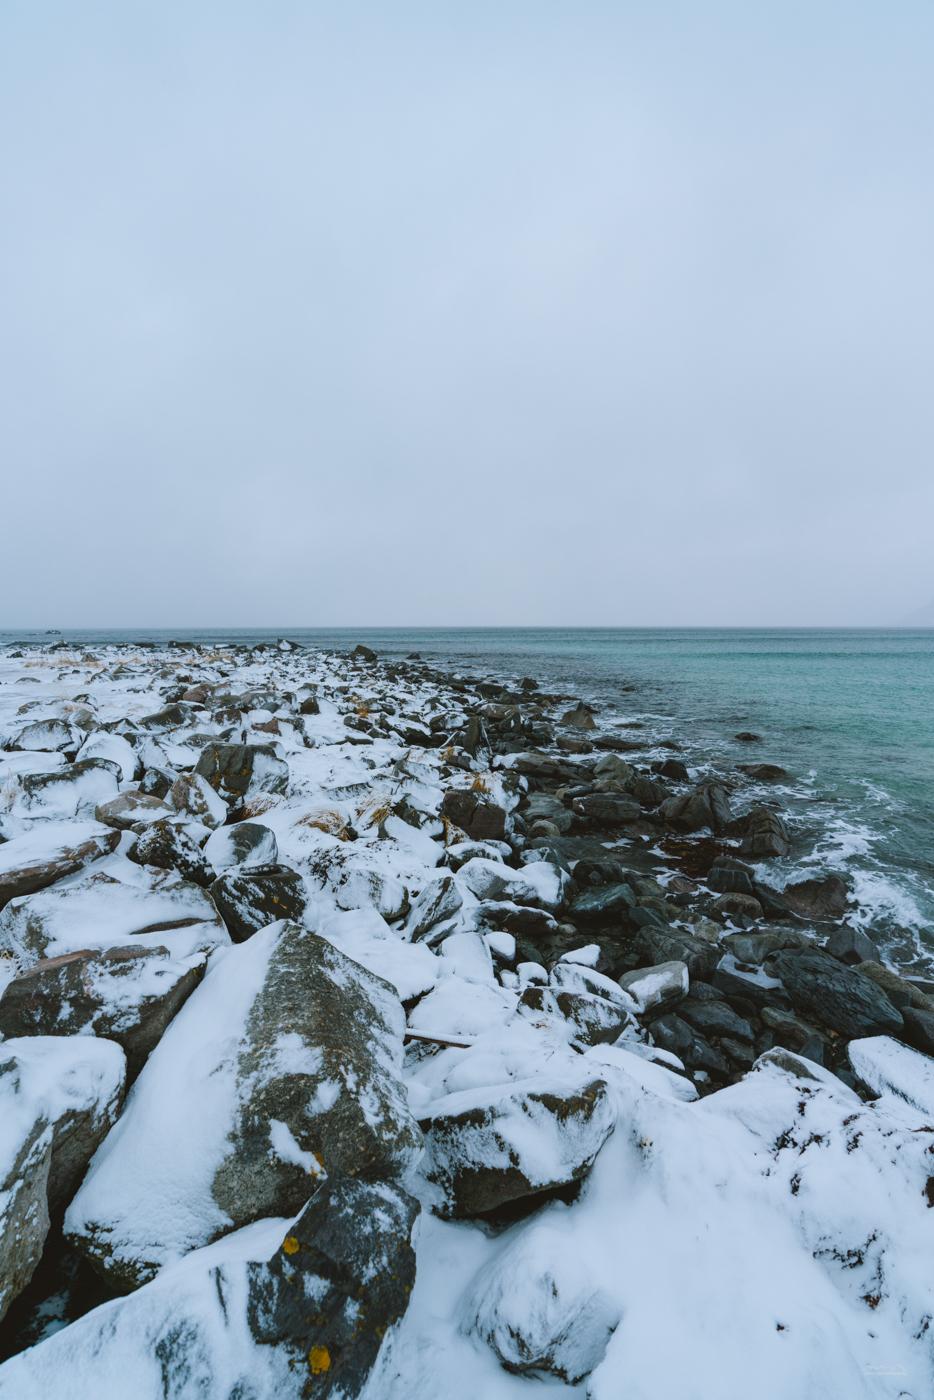 Moody Skagsanden beach in Lofoten